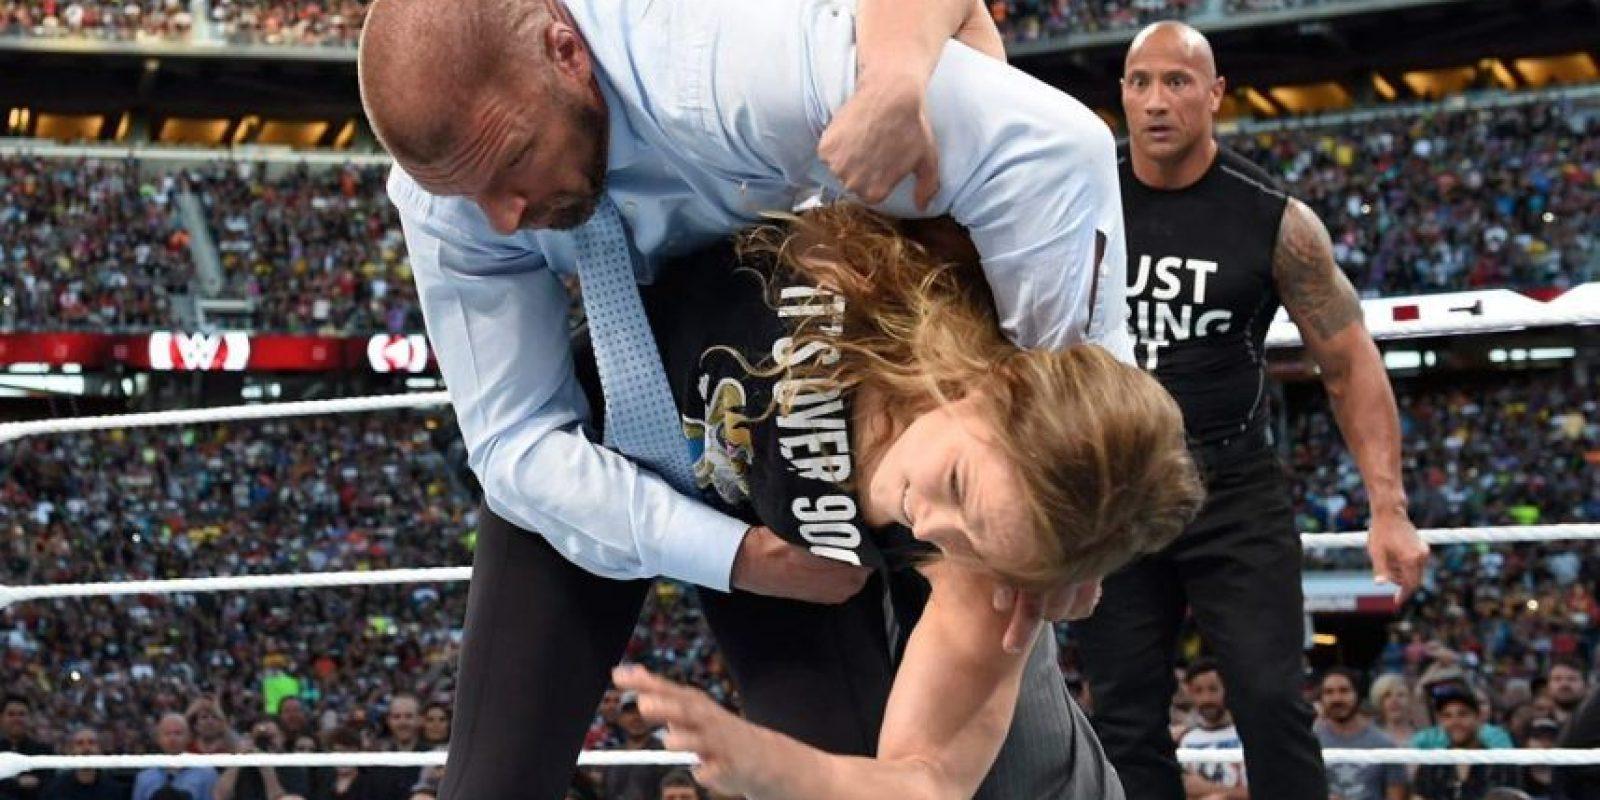 Primero castigó al Jefe de Operaciones de la WWE Foto:WWE